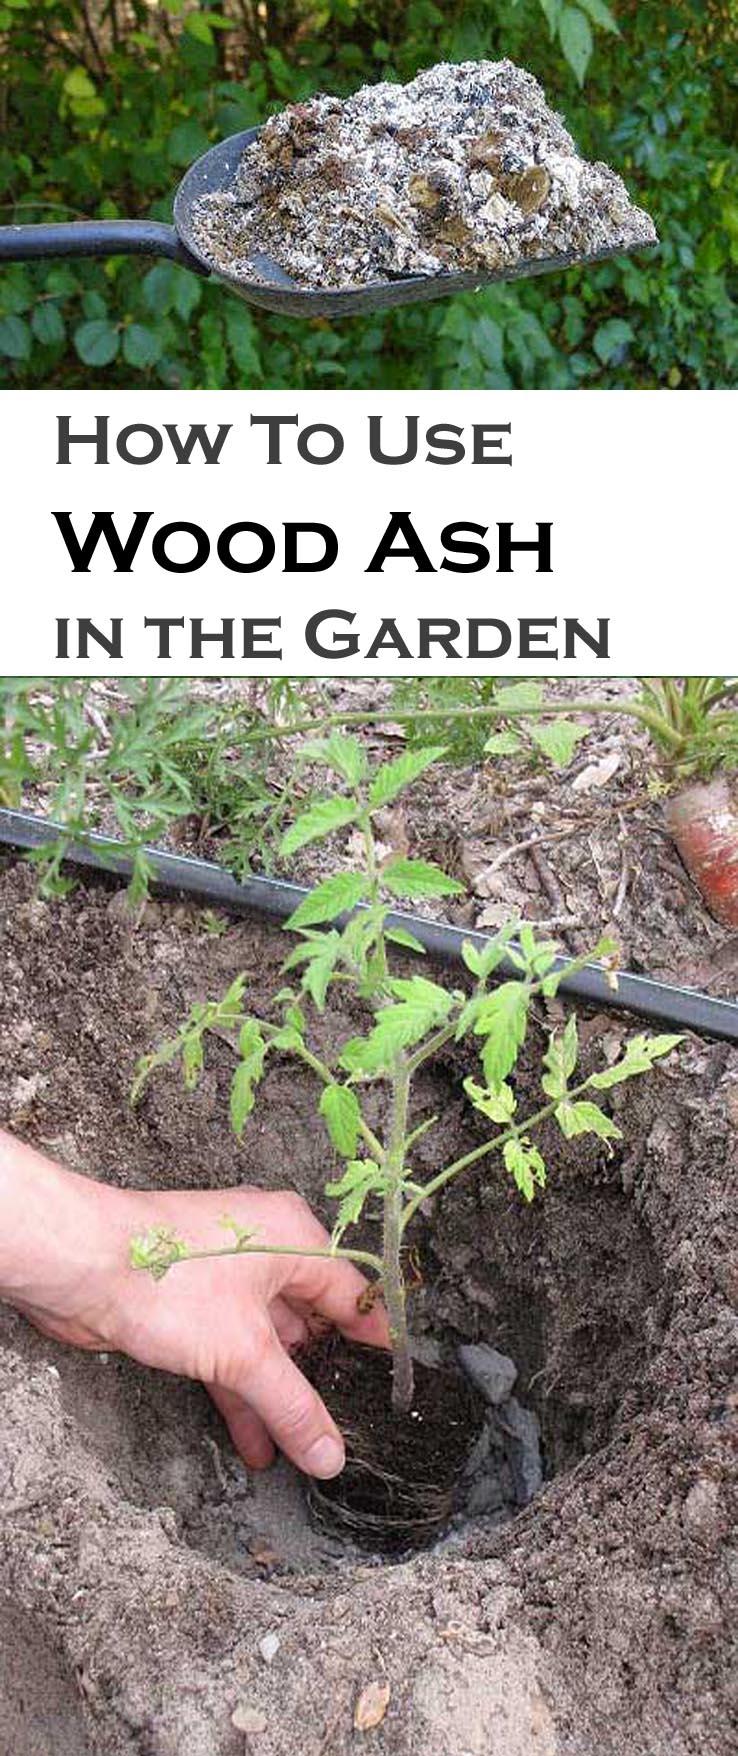 wood ash in the garden